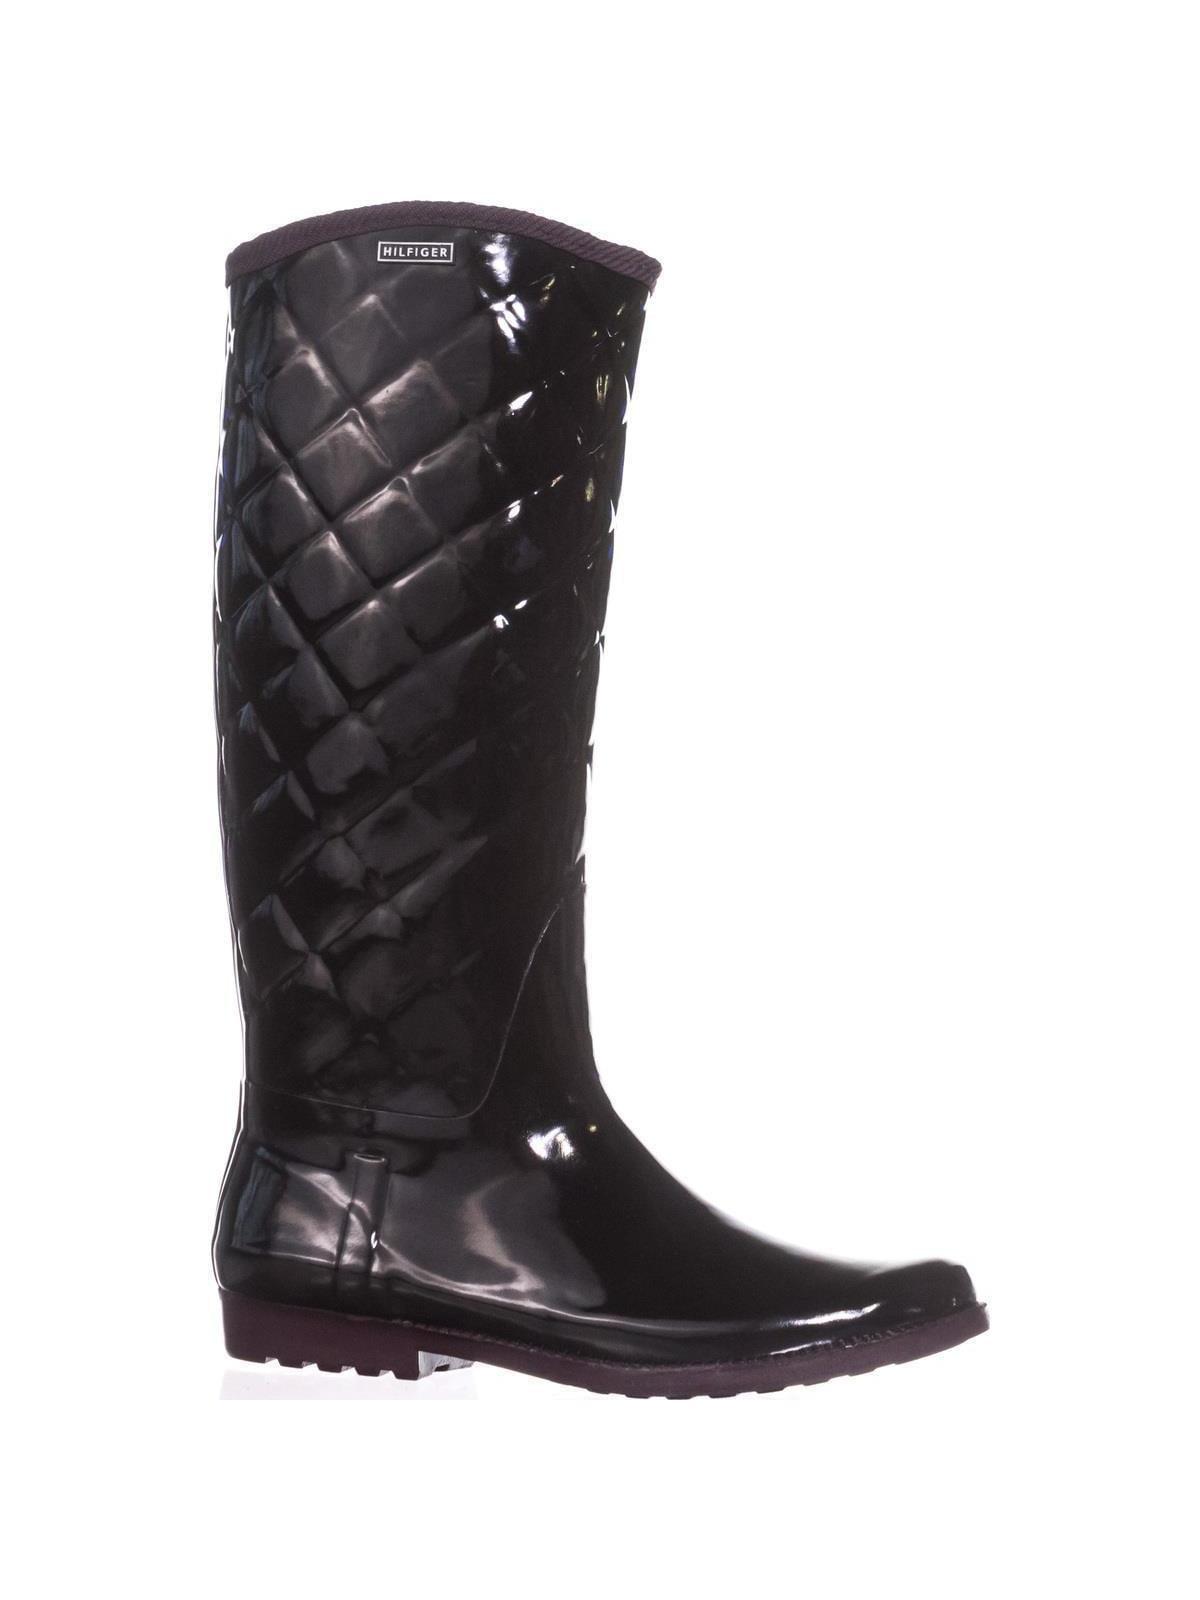 6b921b50093a0 Tommy Hilfiger Vintage Rain Boots, Black Multi